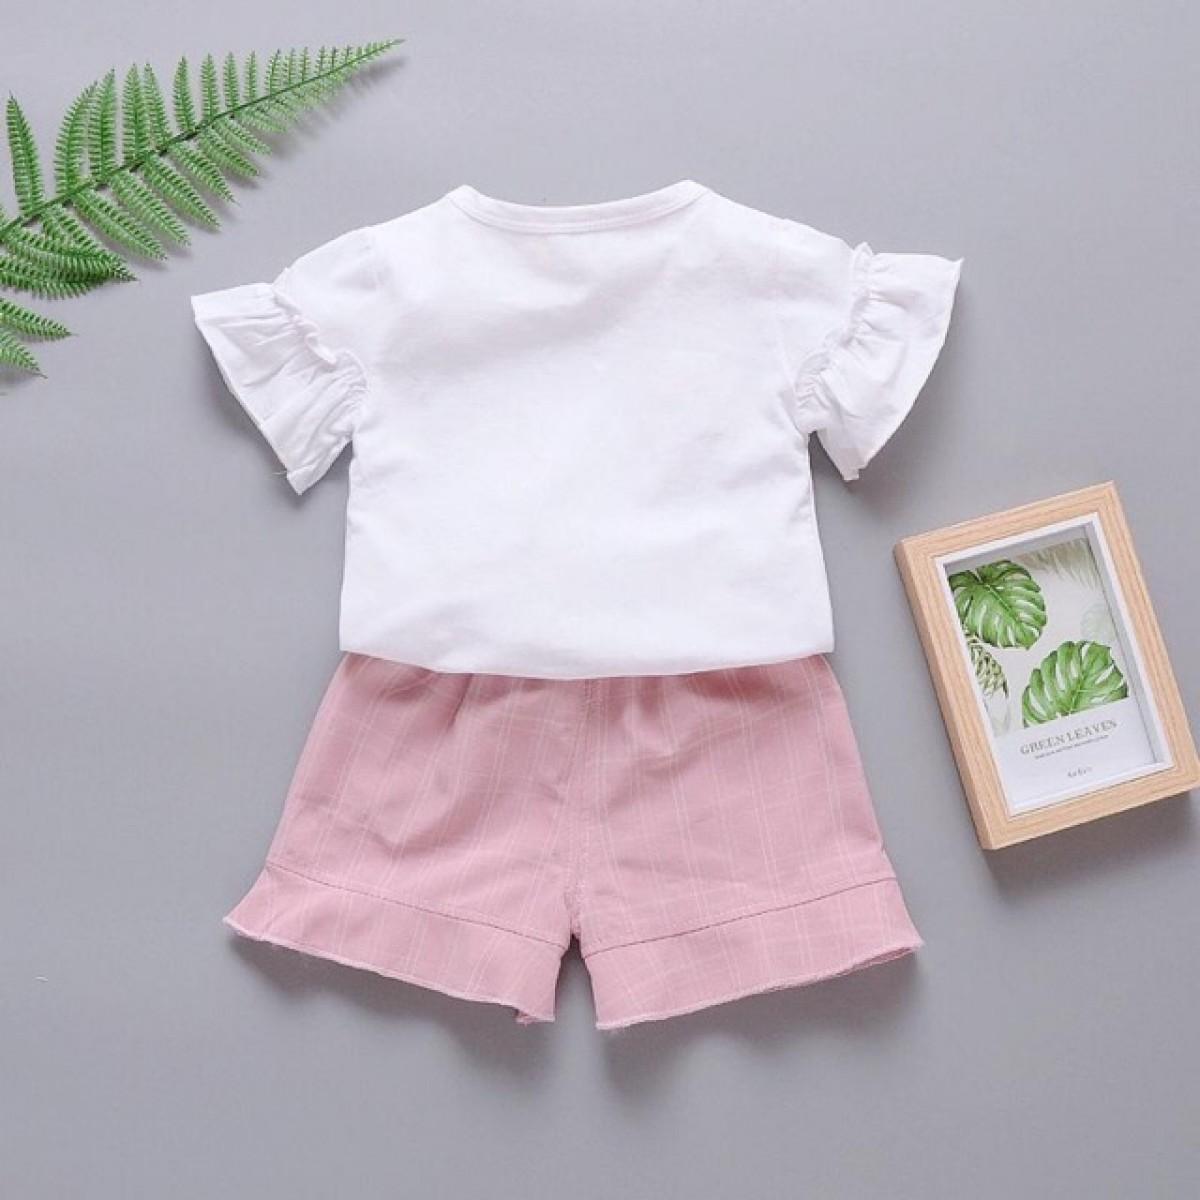 Setelan Anak Cewe Korea Cantik 1 - Bunda Ina Shop